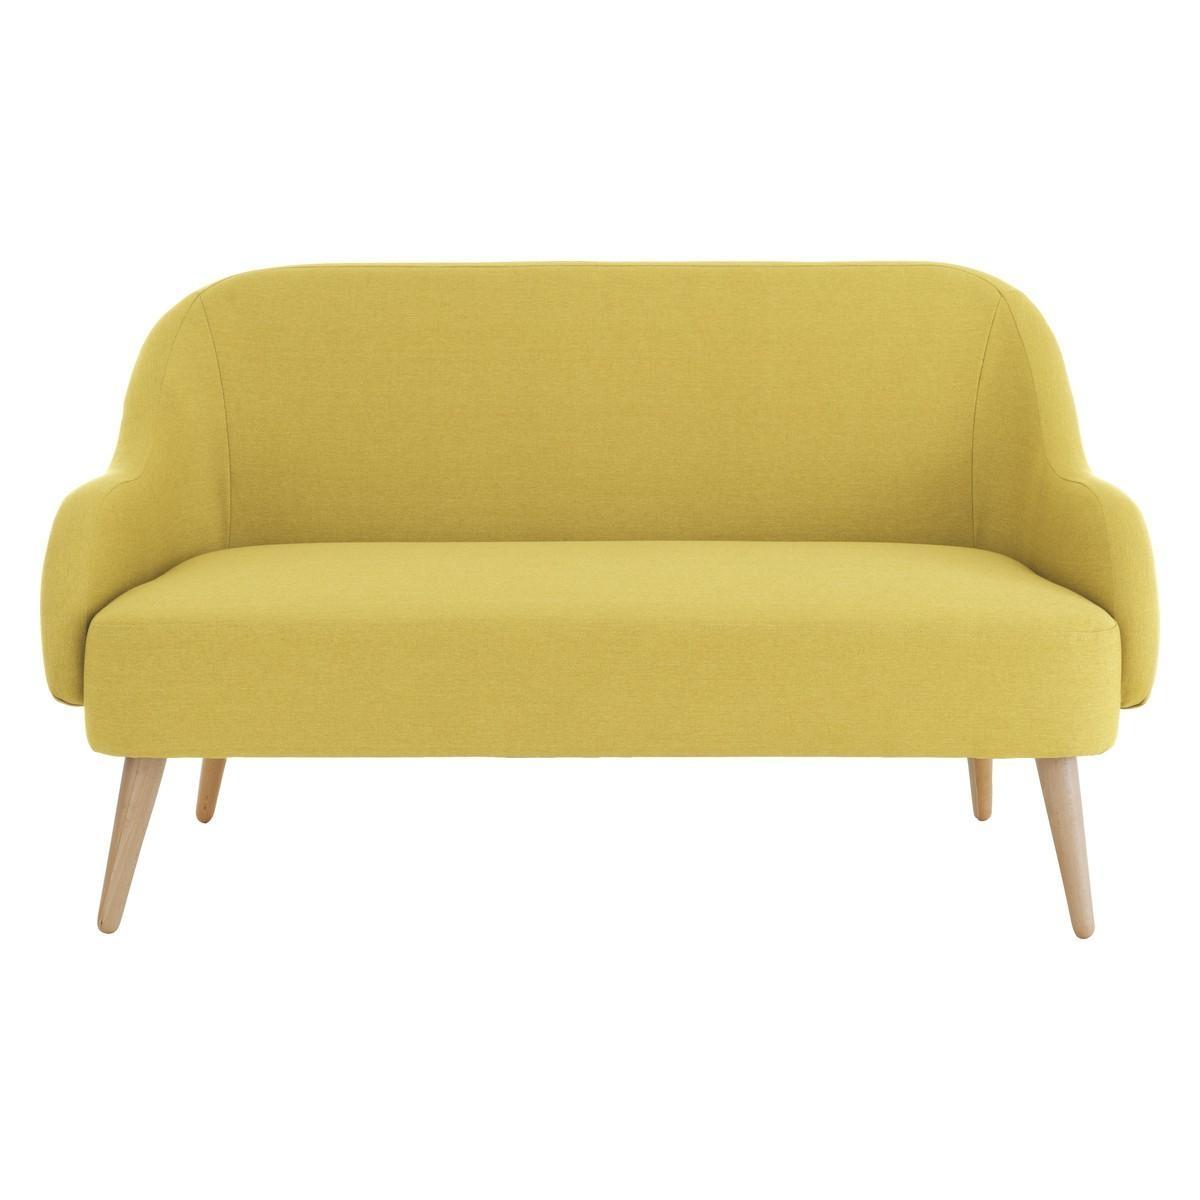 Dreipunkt Designer Leather Sofa Mustard Yellow Two Seat: 20 Photos Yellow Sofa Chairs